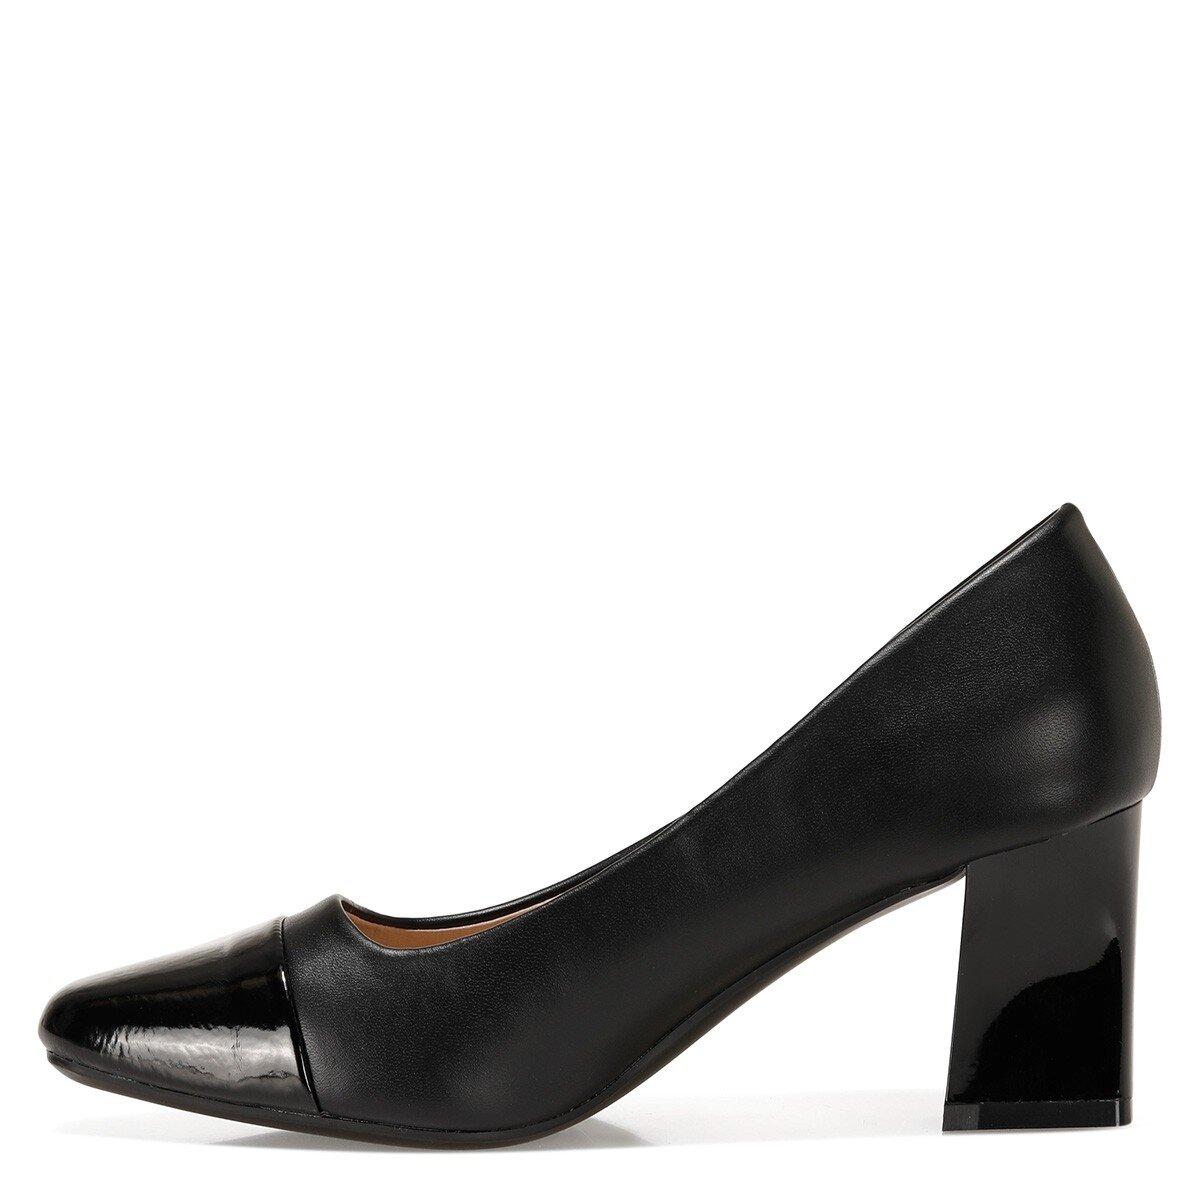 JOLLYRA 1FX Siyah Kadın Topuklu Ayakkabı